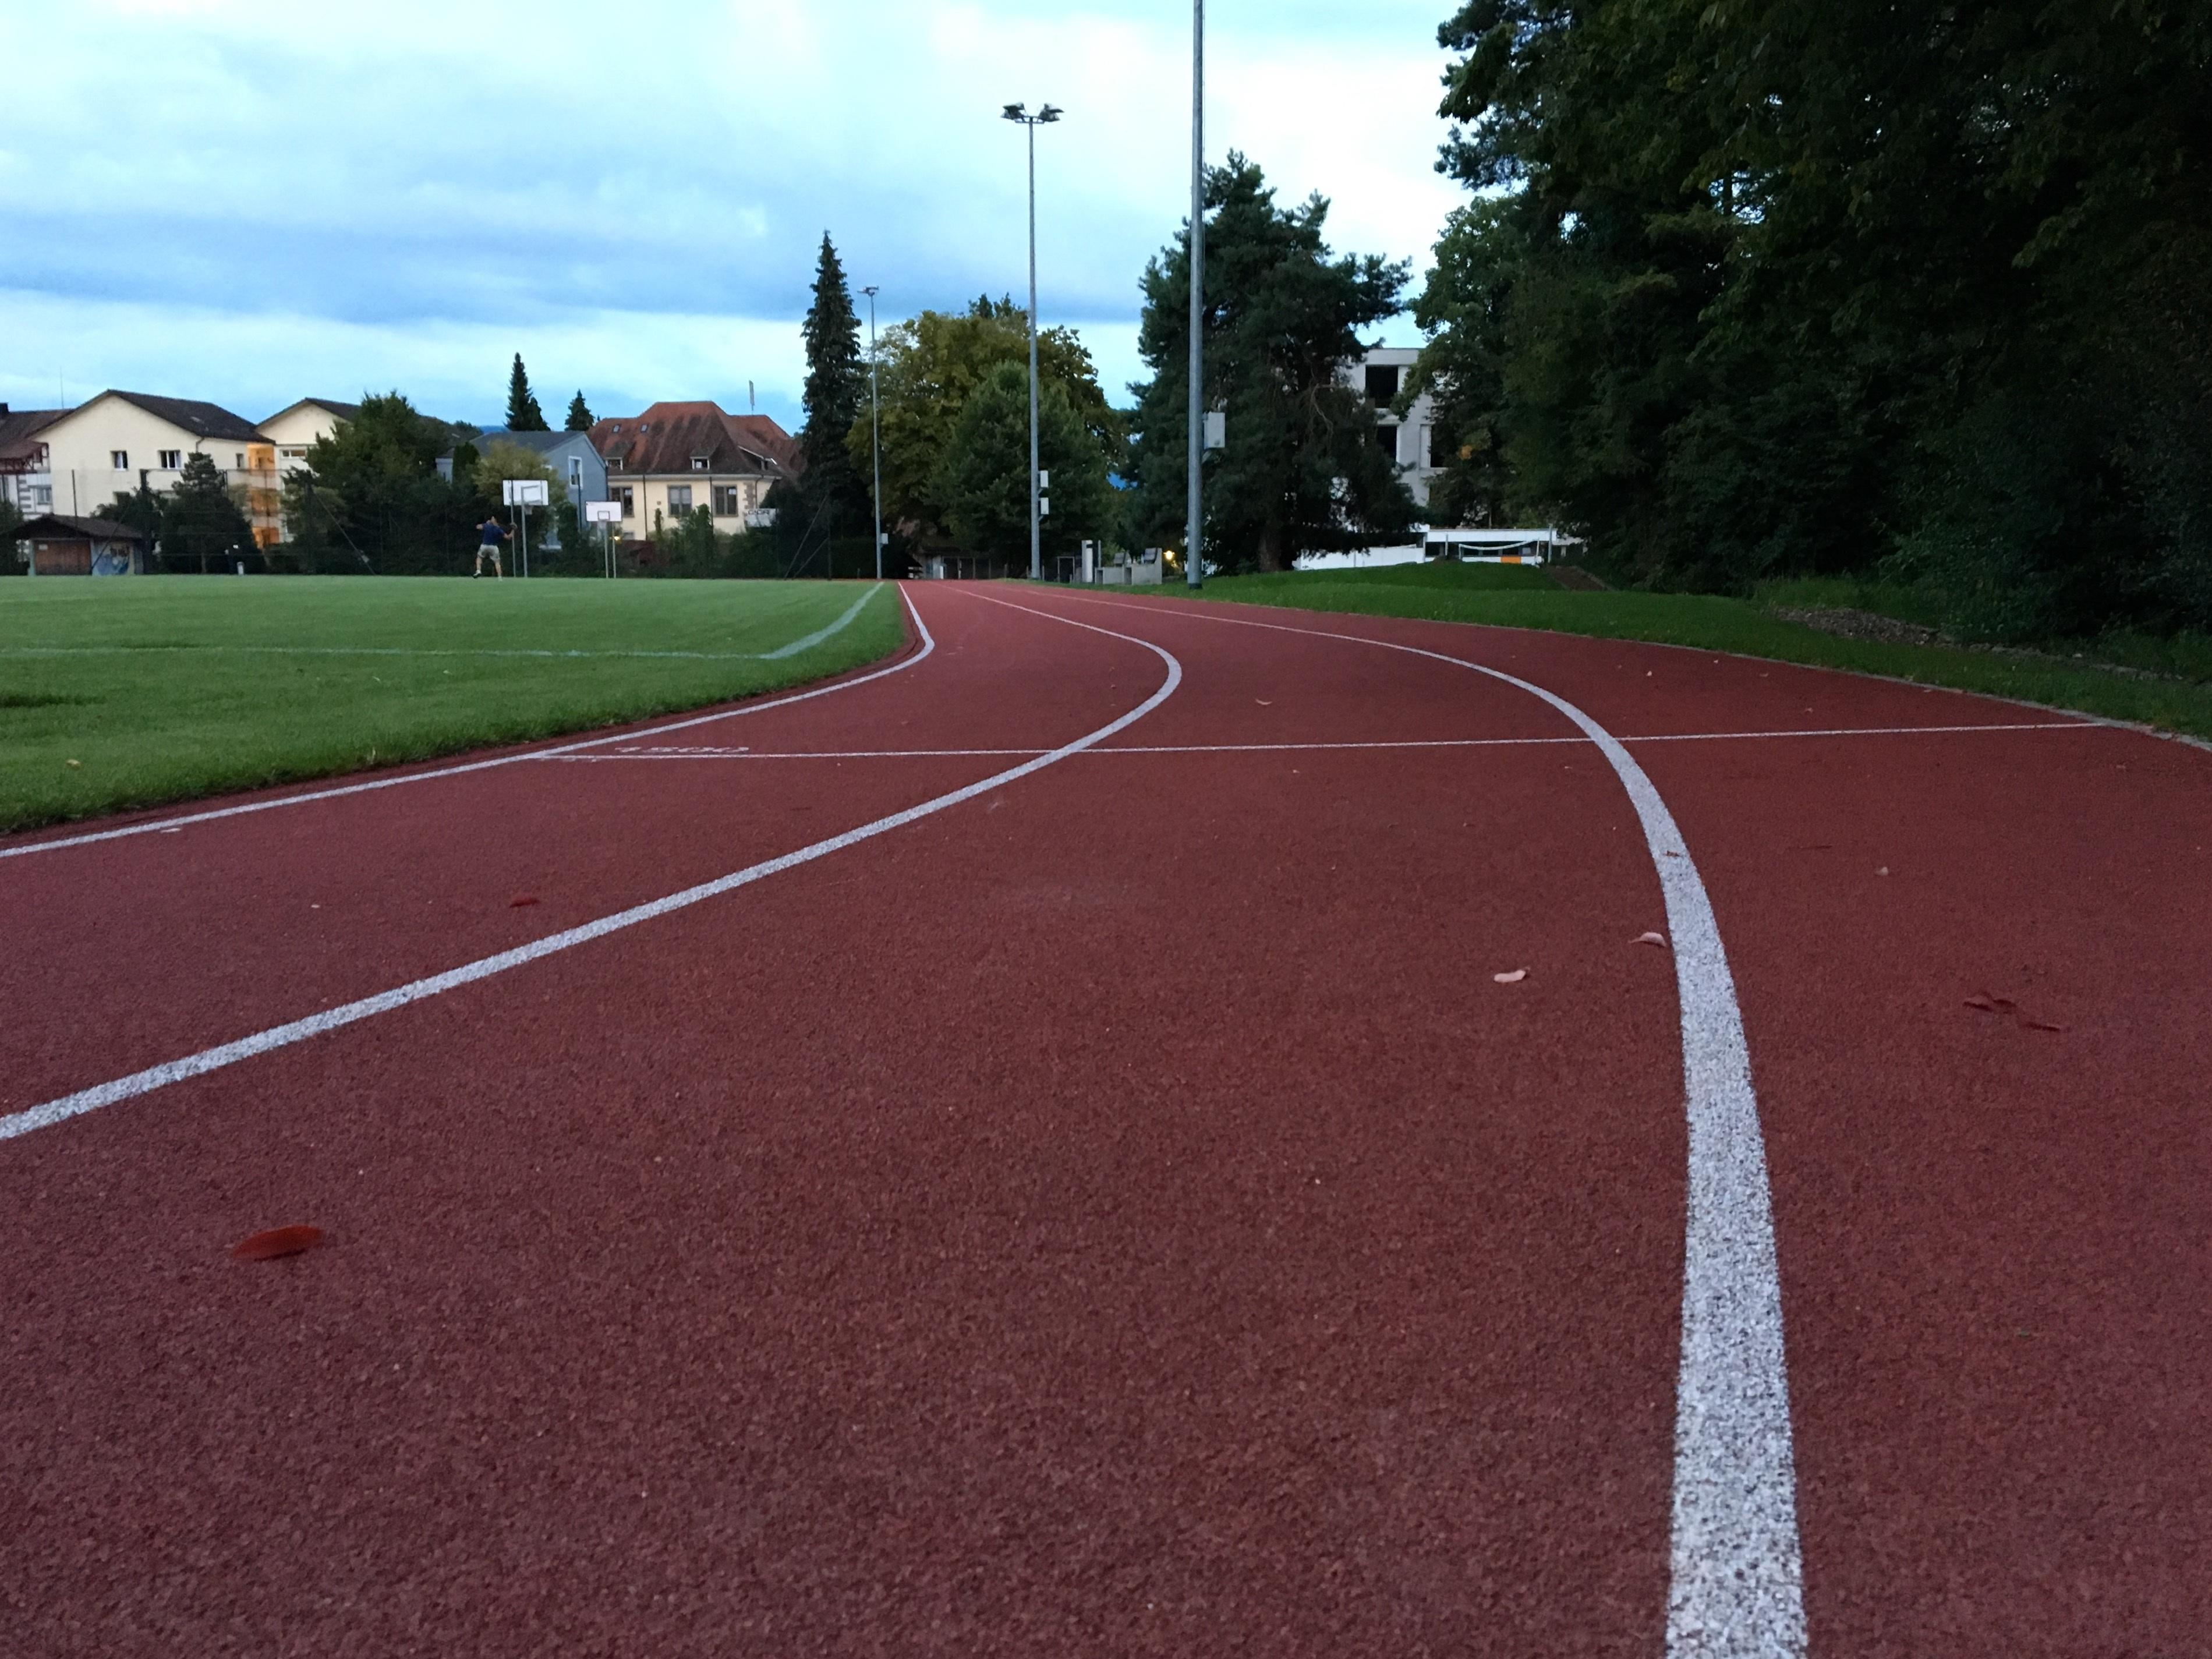 free images   structure  run  asphalt  red  leisure  lane  fitness  stadium  baseball field